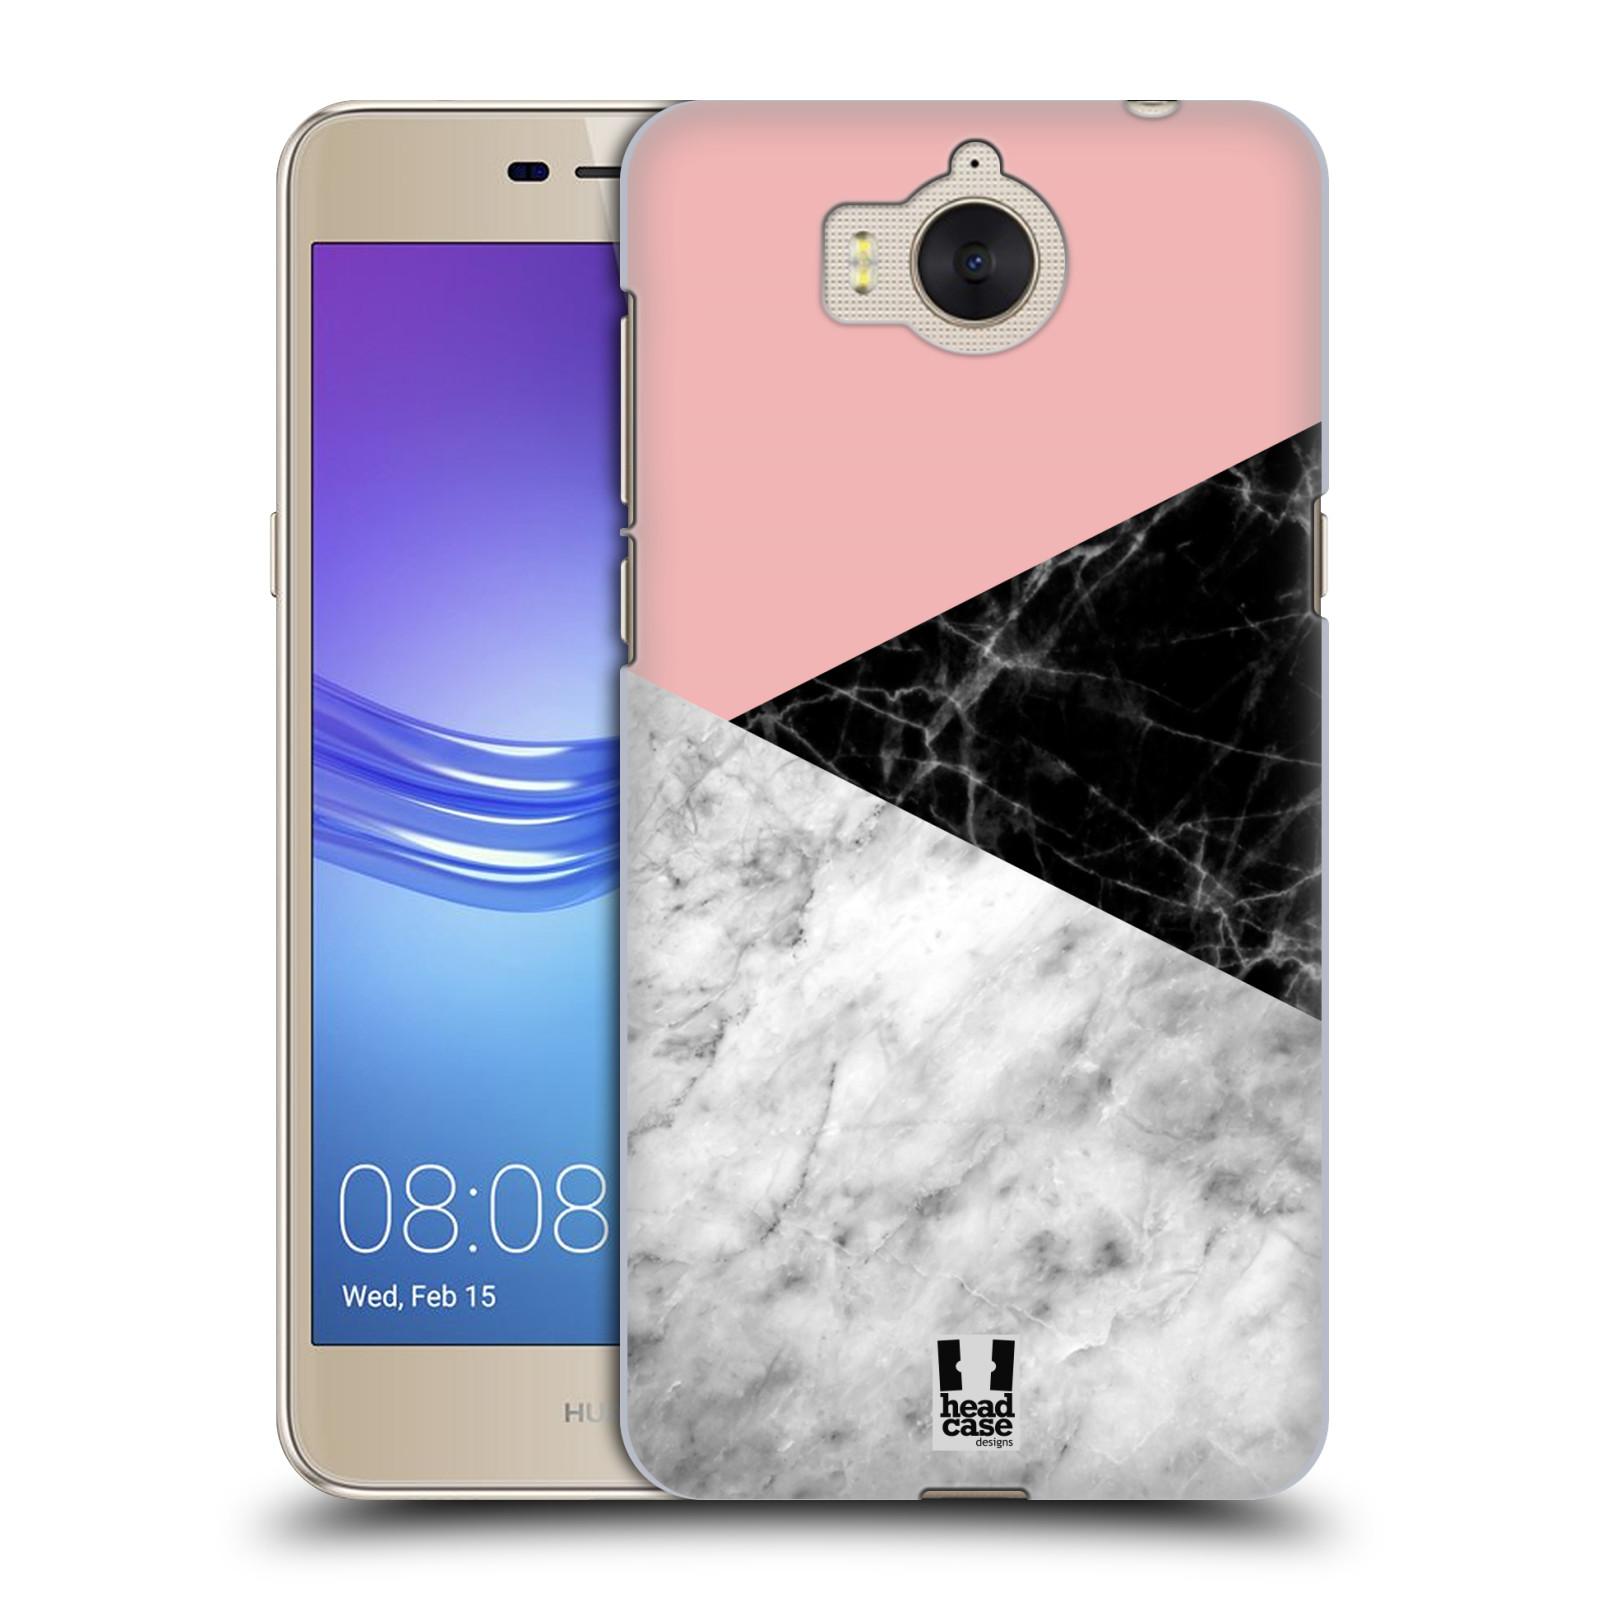 Plastové pouzdro na mobil Huawei Y6 2017 - Head Case - Mramor mix